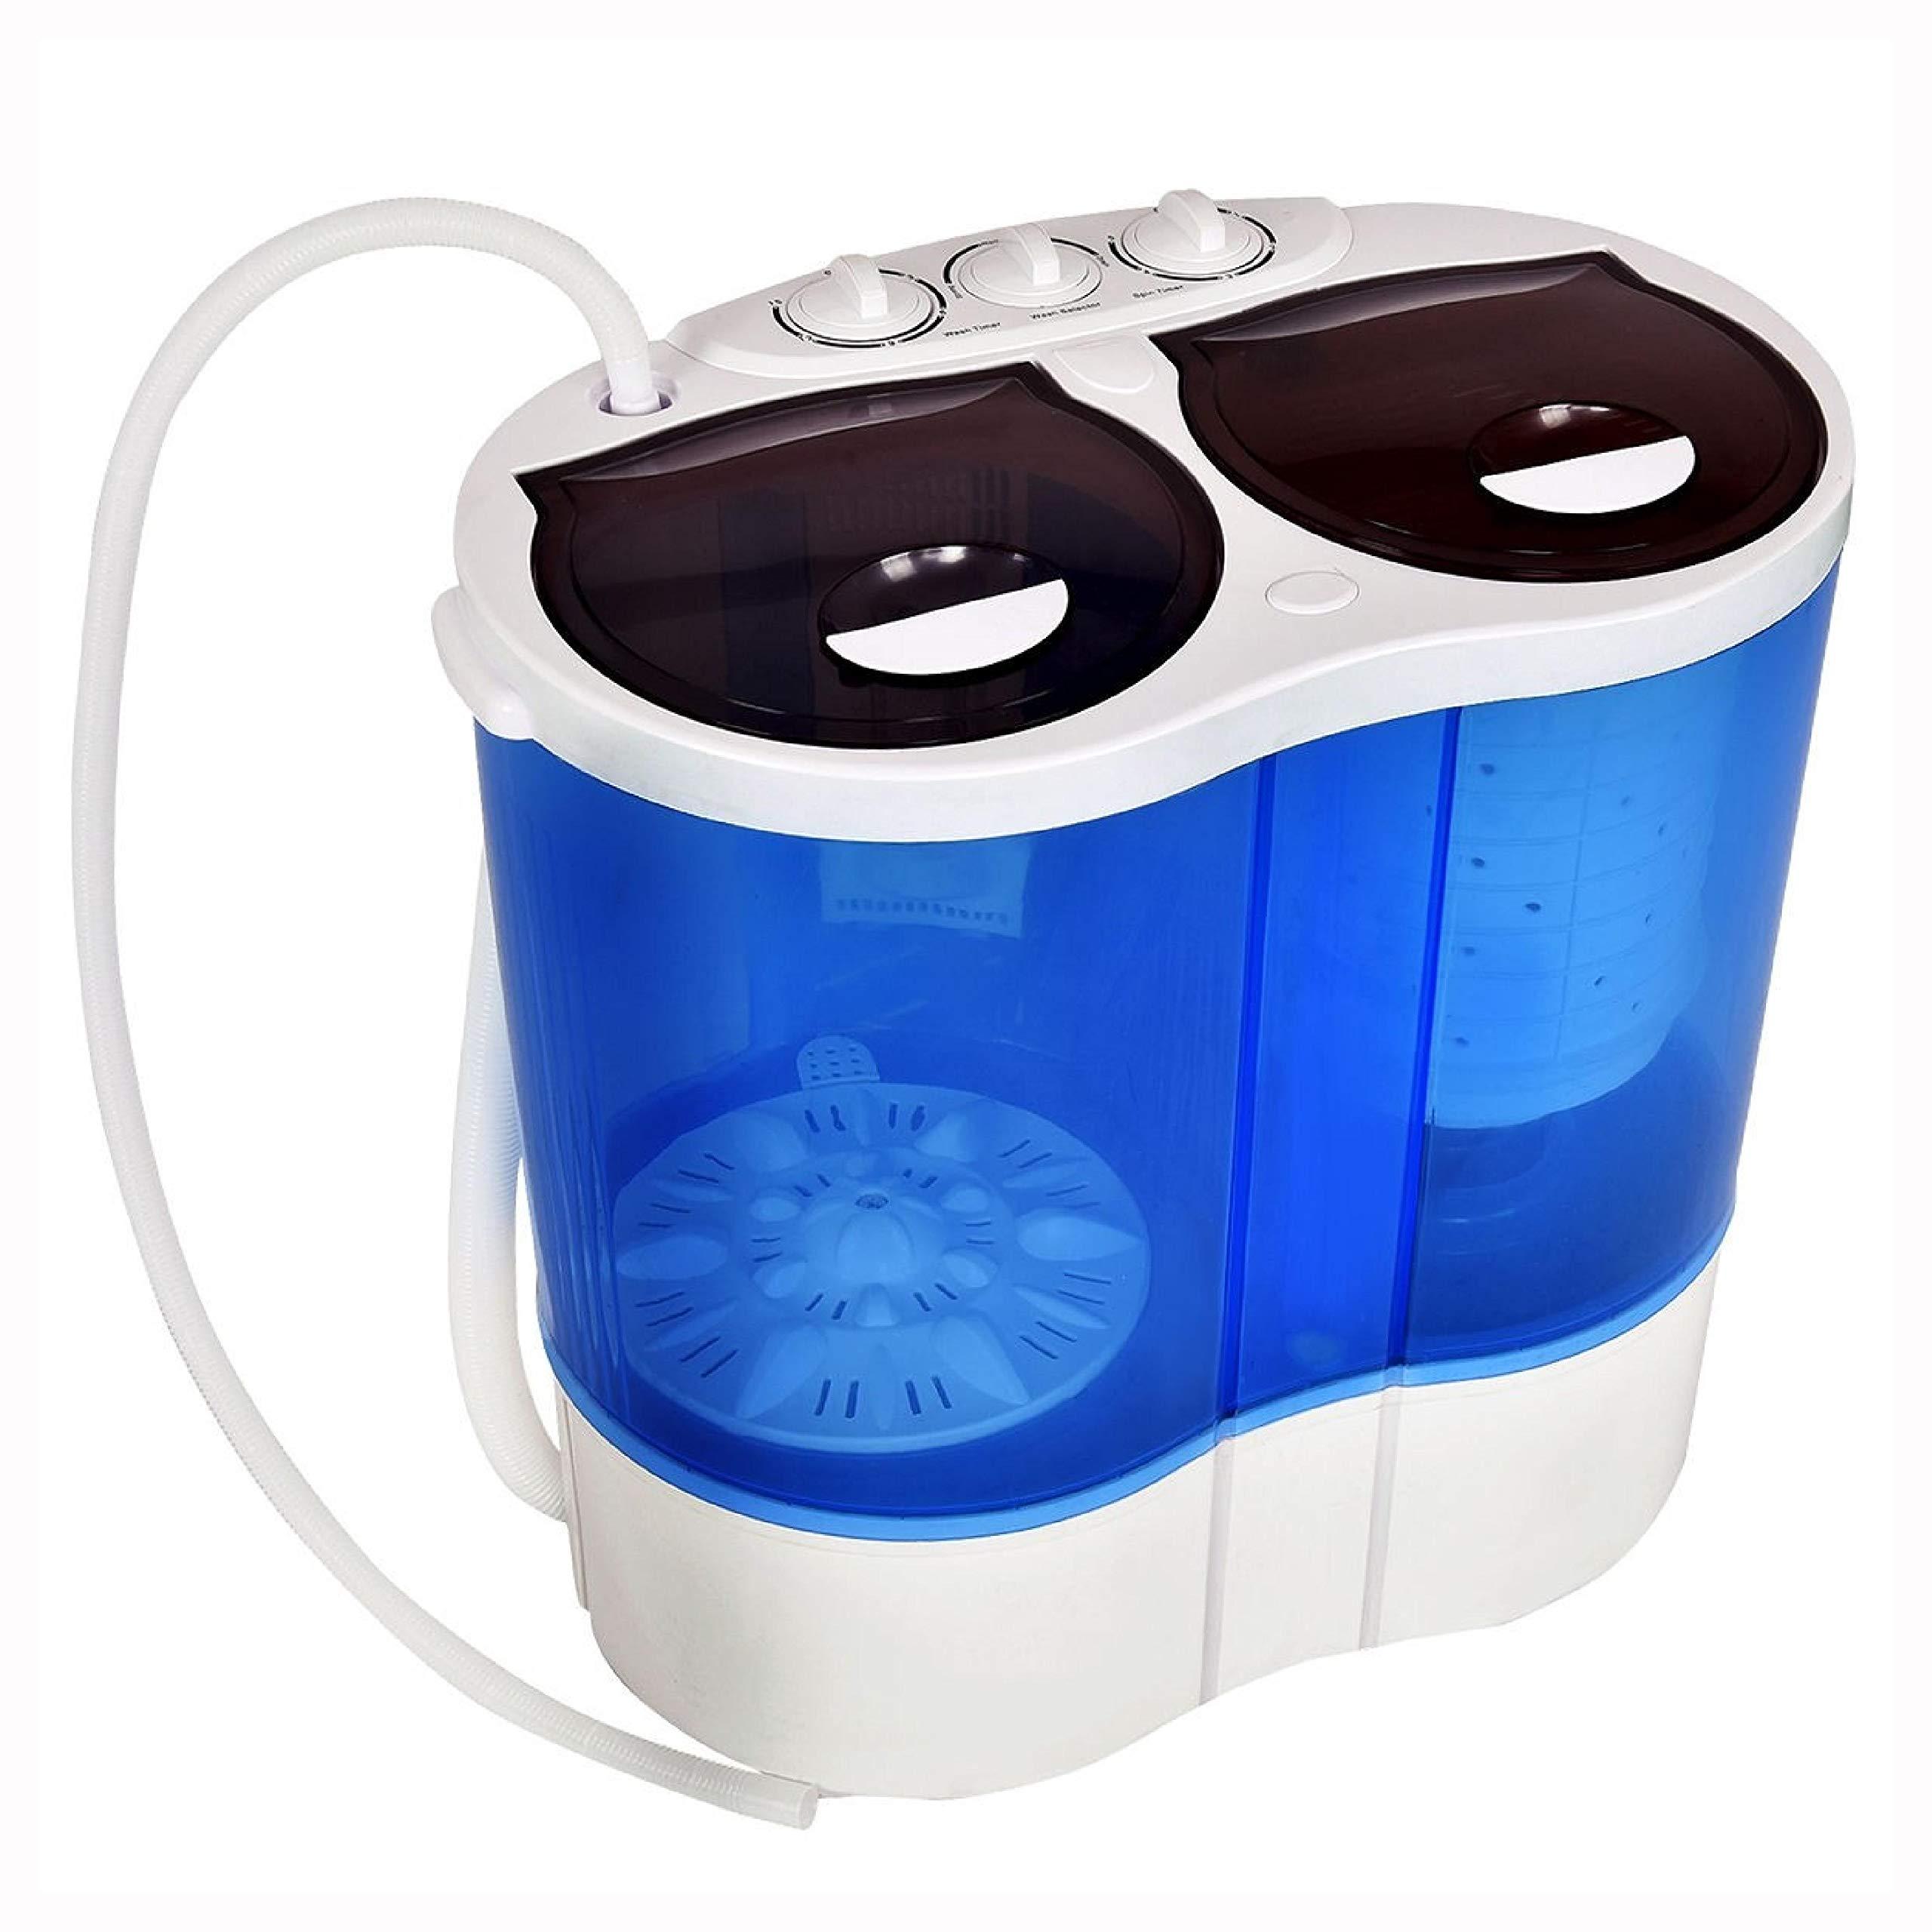 Washing Machine, 15 lbs Portable Compact Twin Tub Mini Washing Machine by HomyDelight (Image #8)